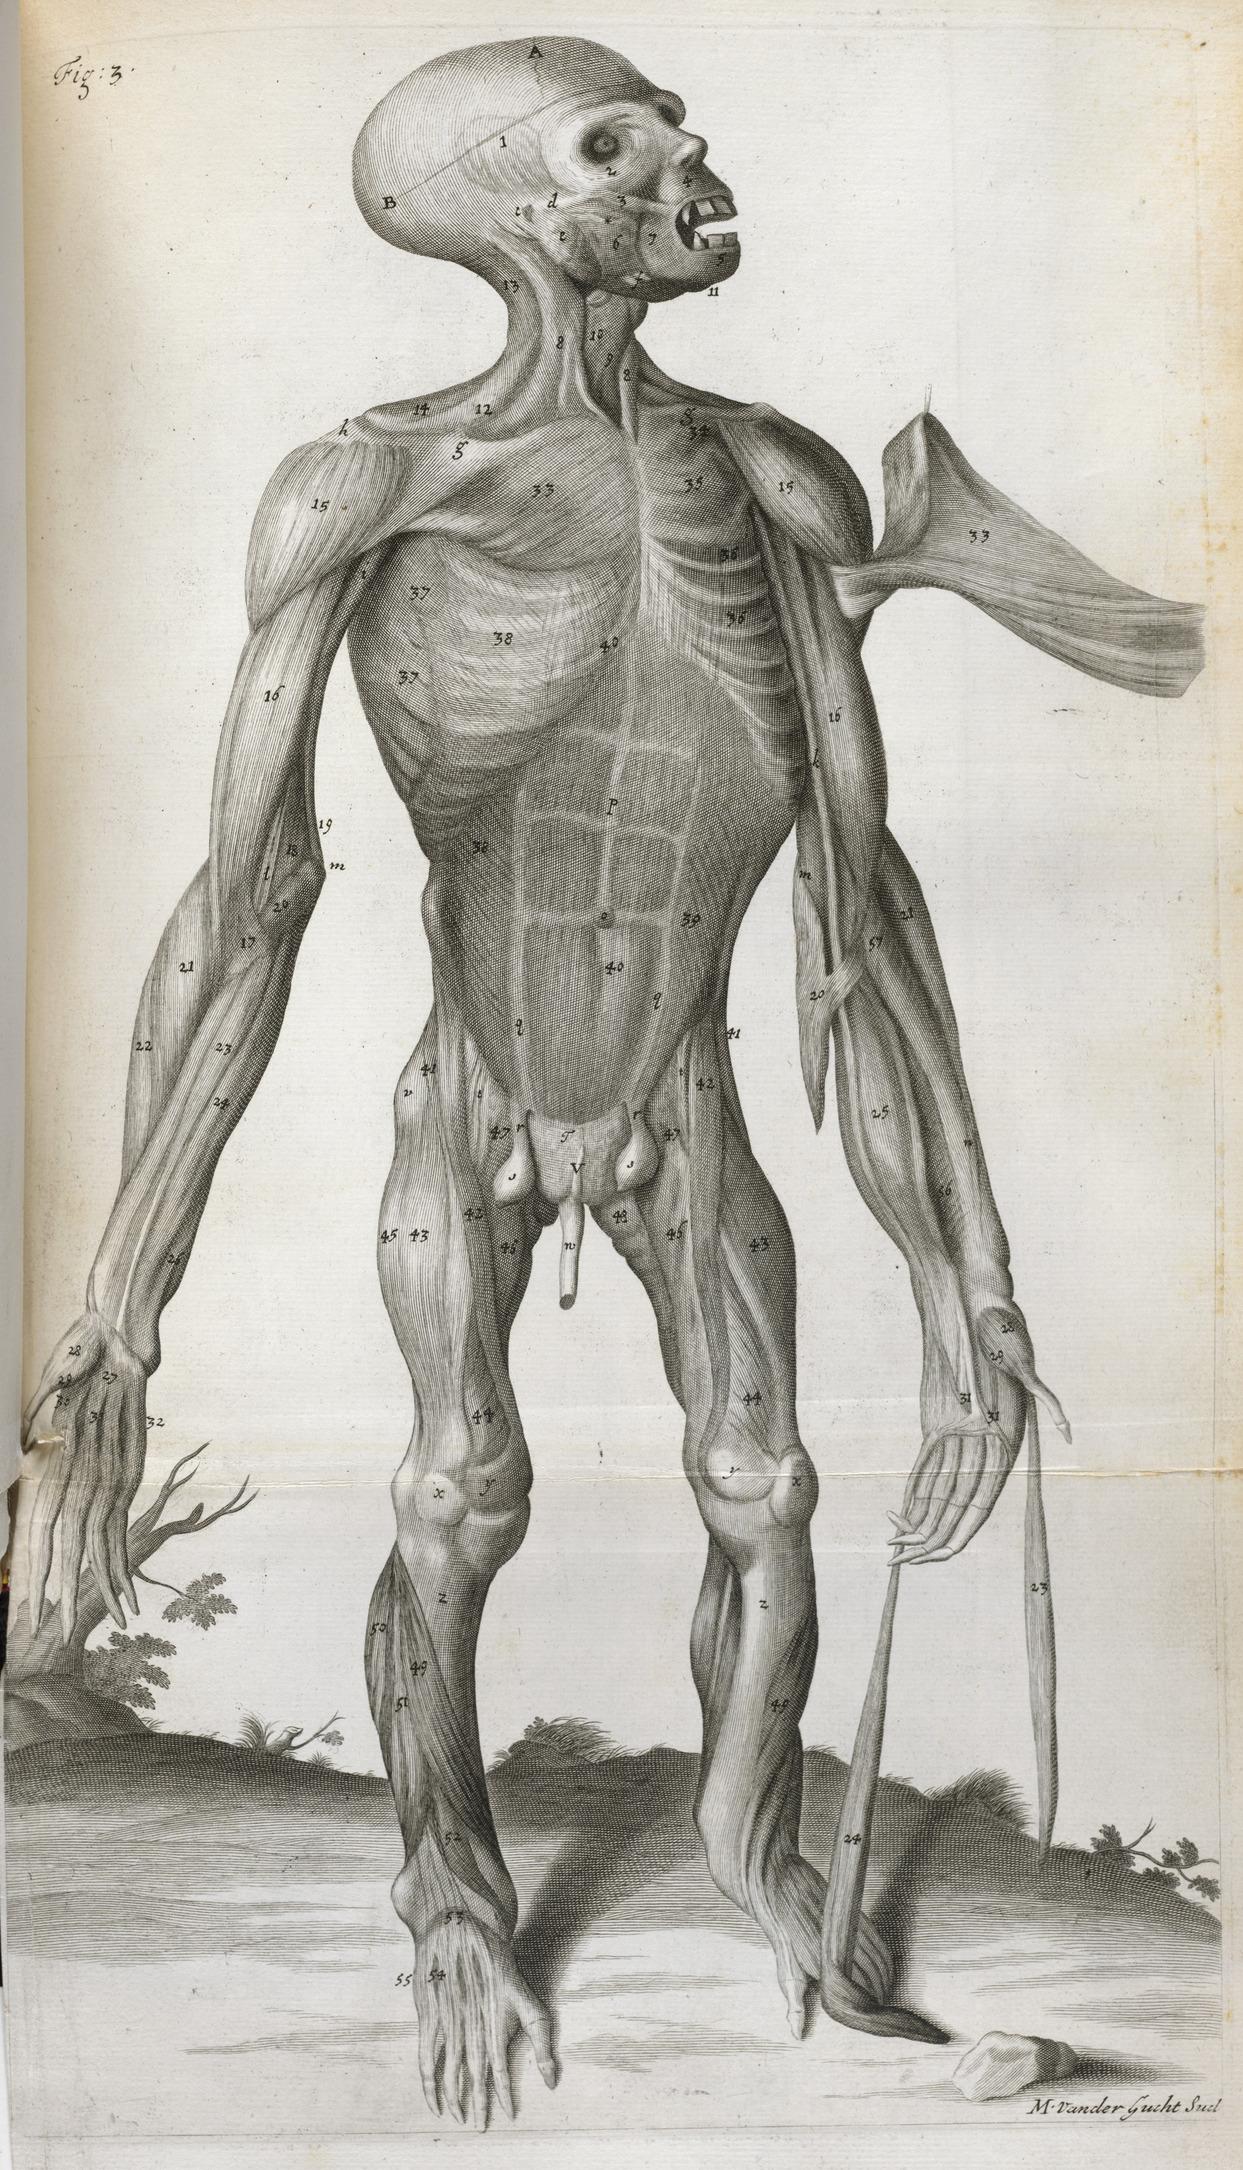 File:Anatomical drawing - Orang-Outang, sive Homo Sylvestris (1699),